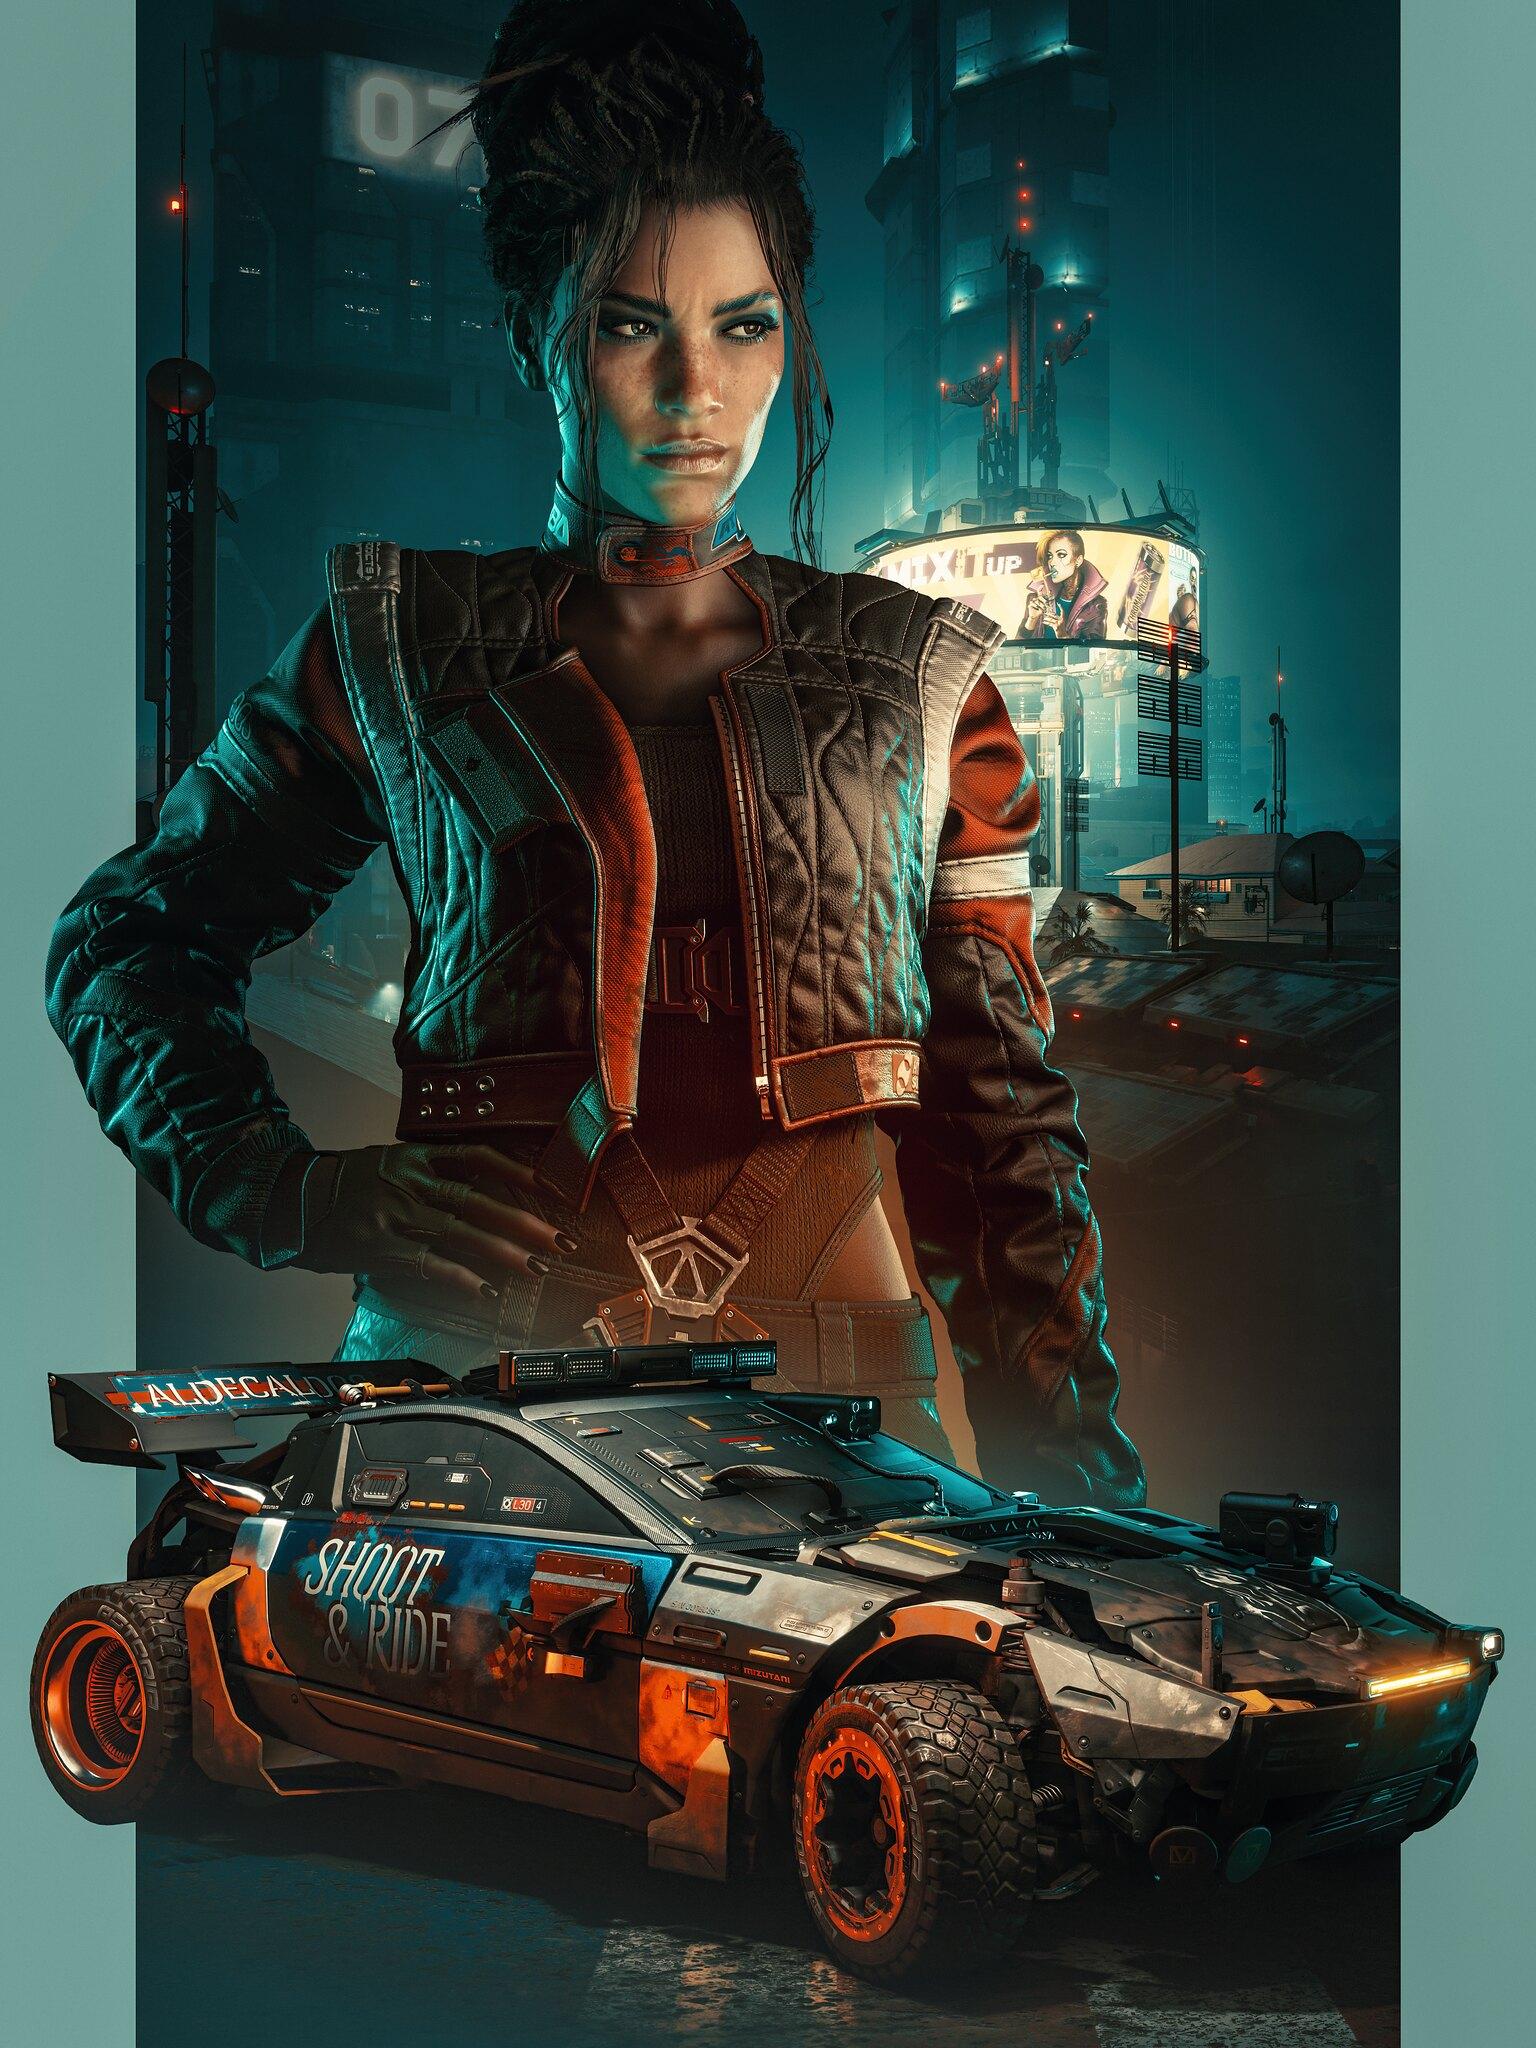 Джейсон Шрайер: Сотрудники Cyberpunk 2077 знали про баги до релиза, а до 2016 года игра была от третьего лица